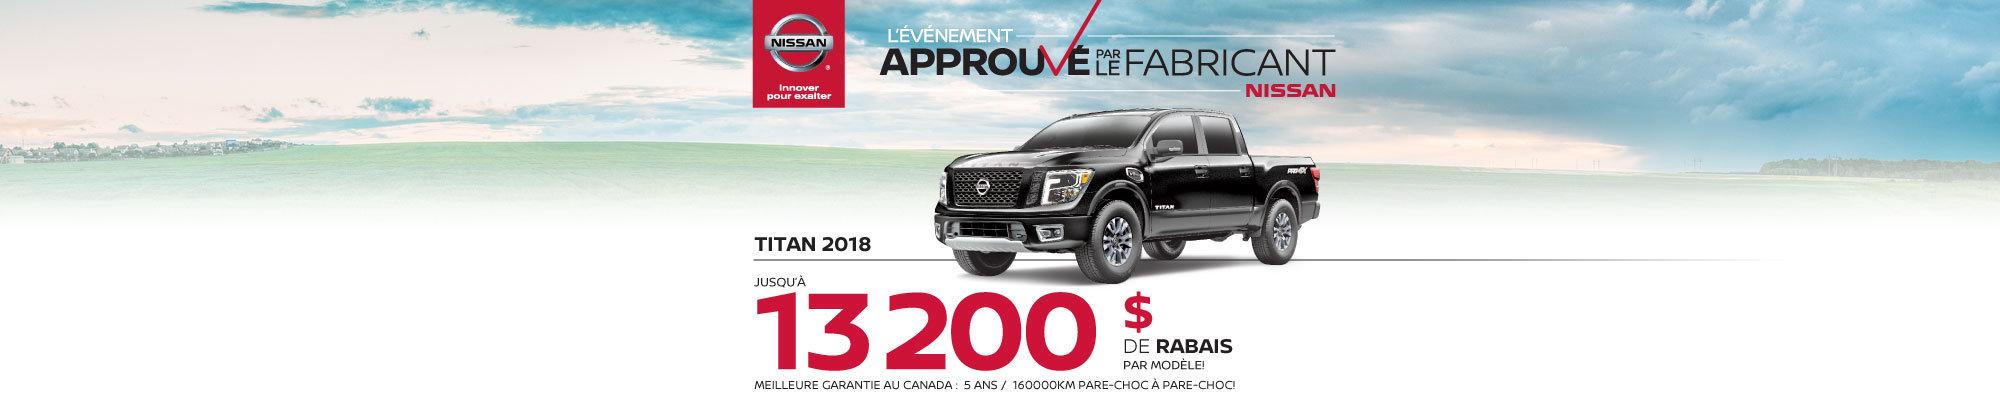 Nissan Titan 2018 web